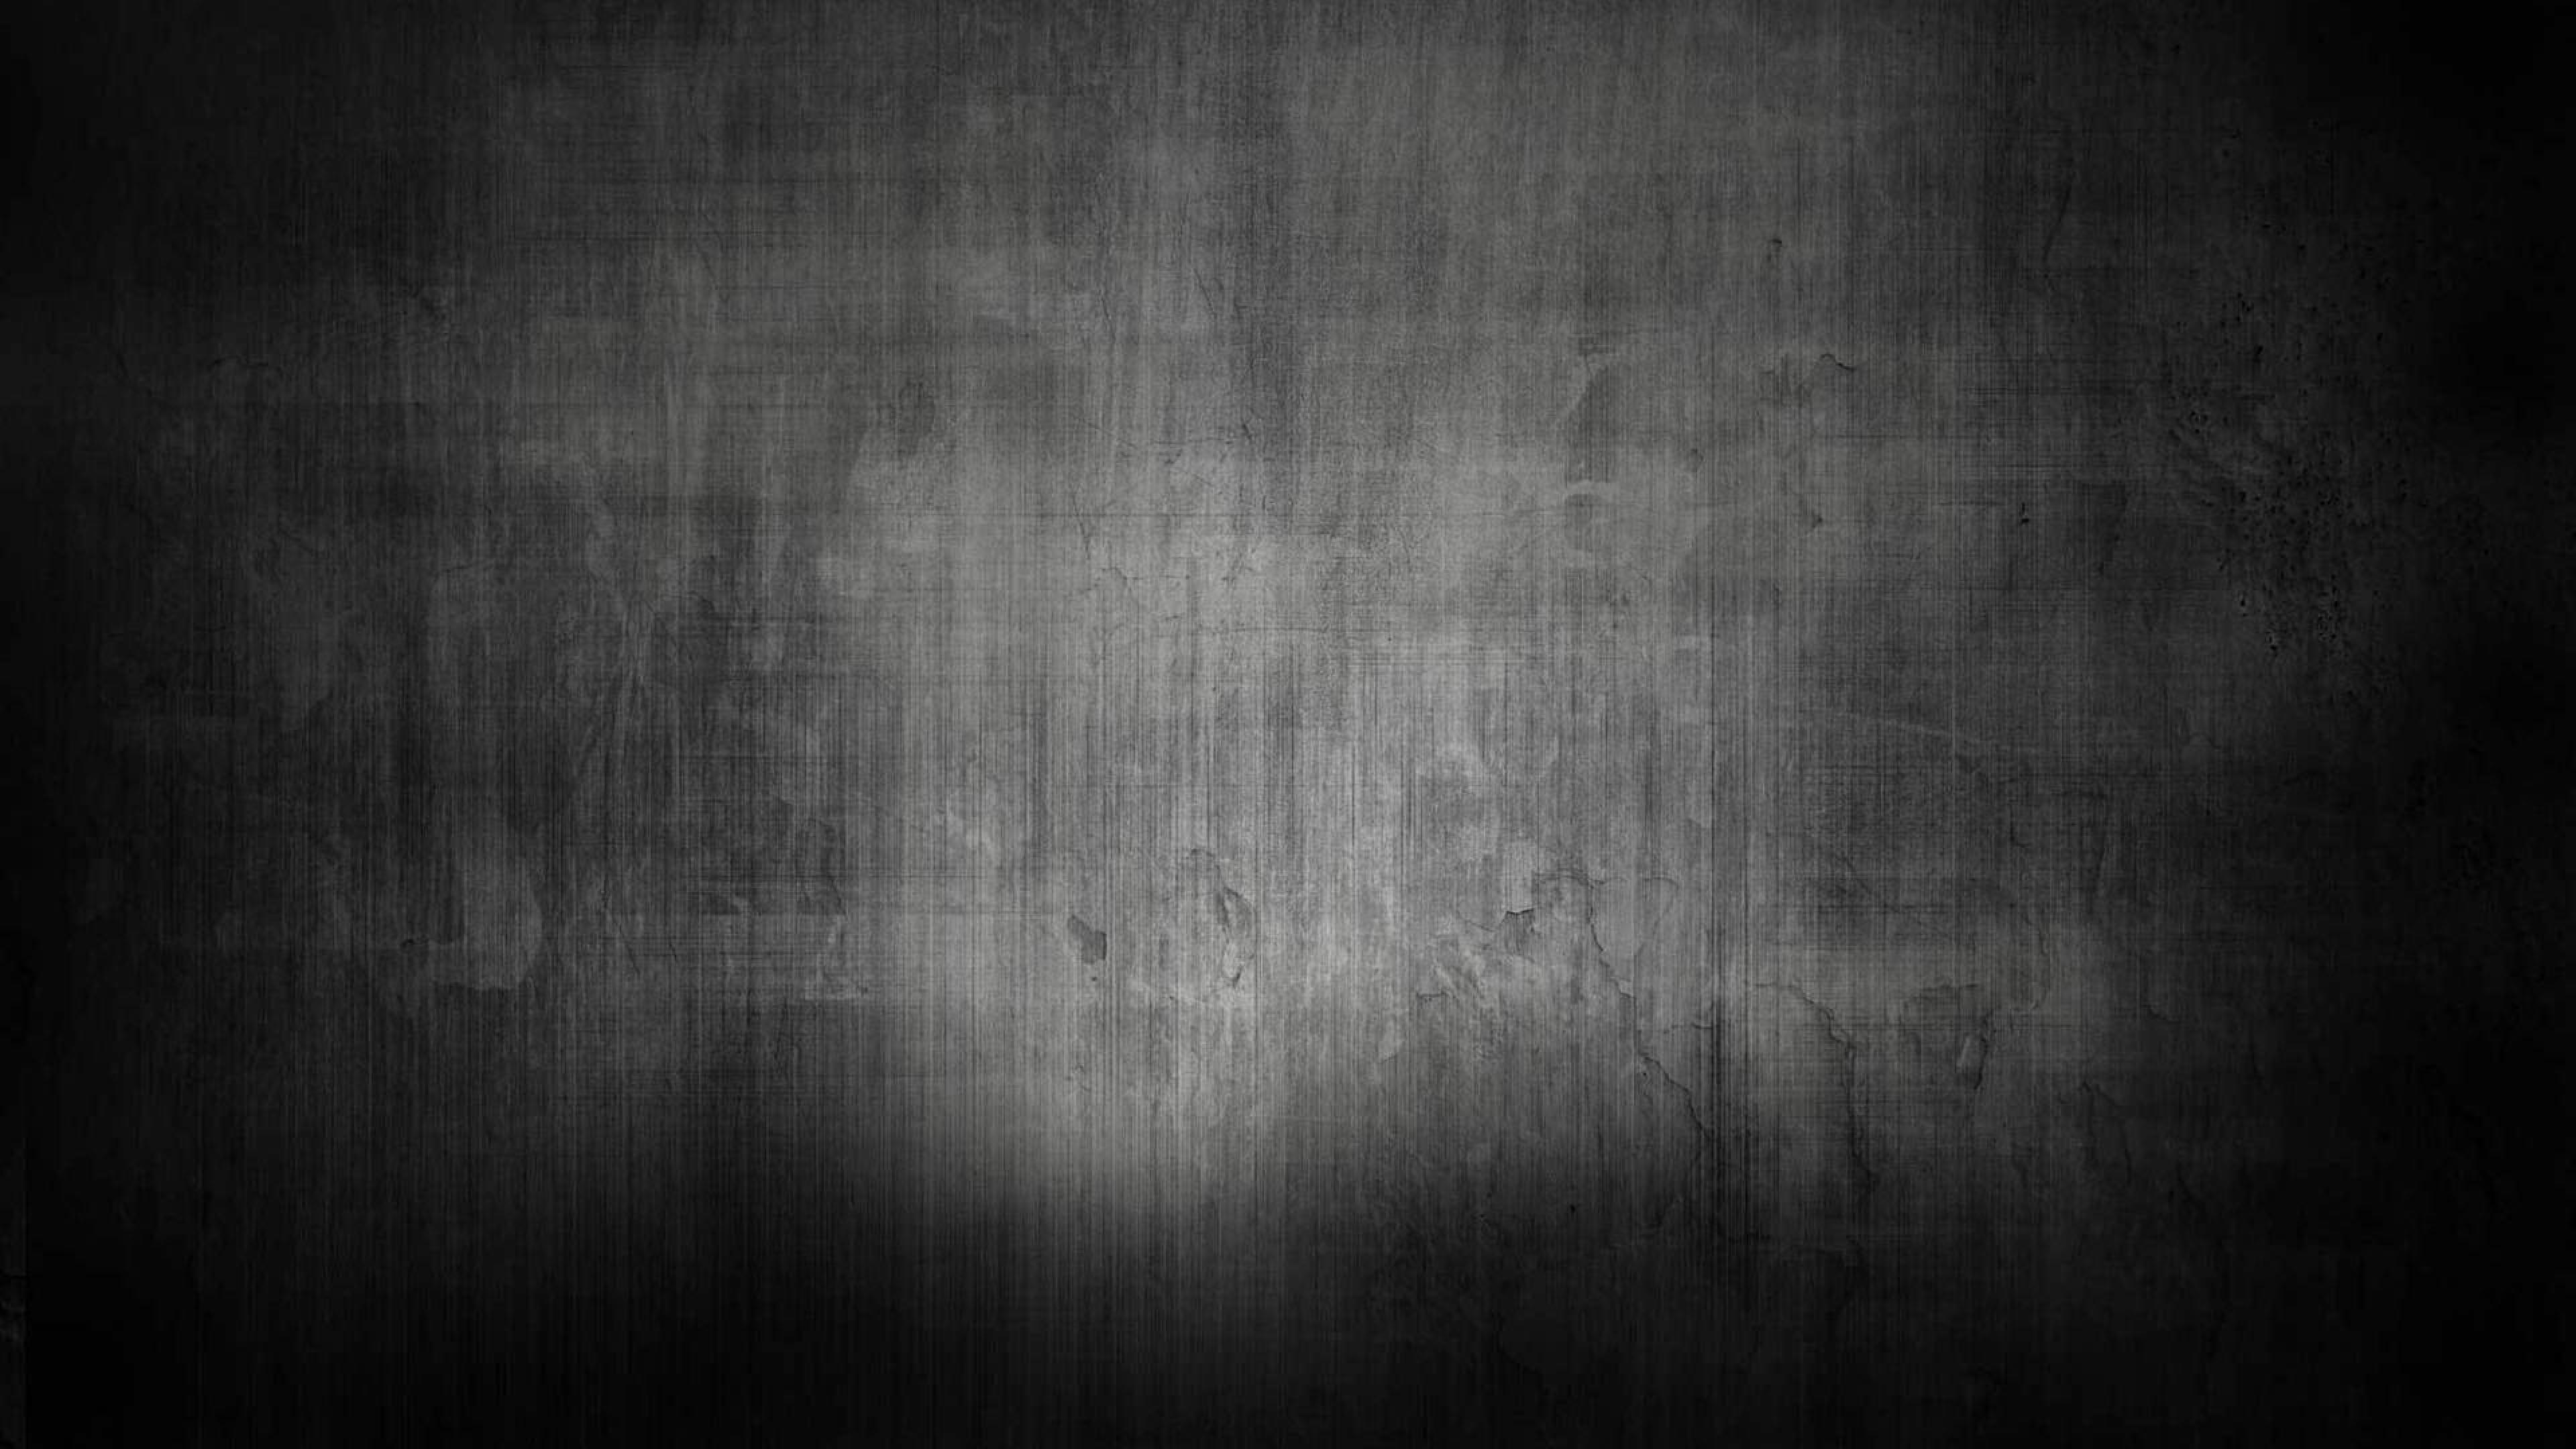 HD Background White Spot Black Texture Wallpaper WallpapersByte 3840x2160